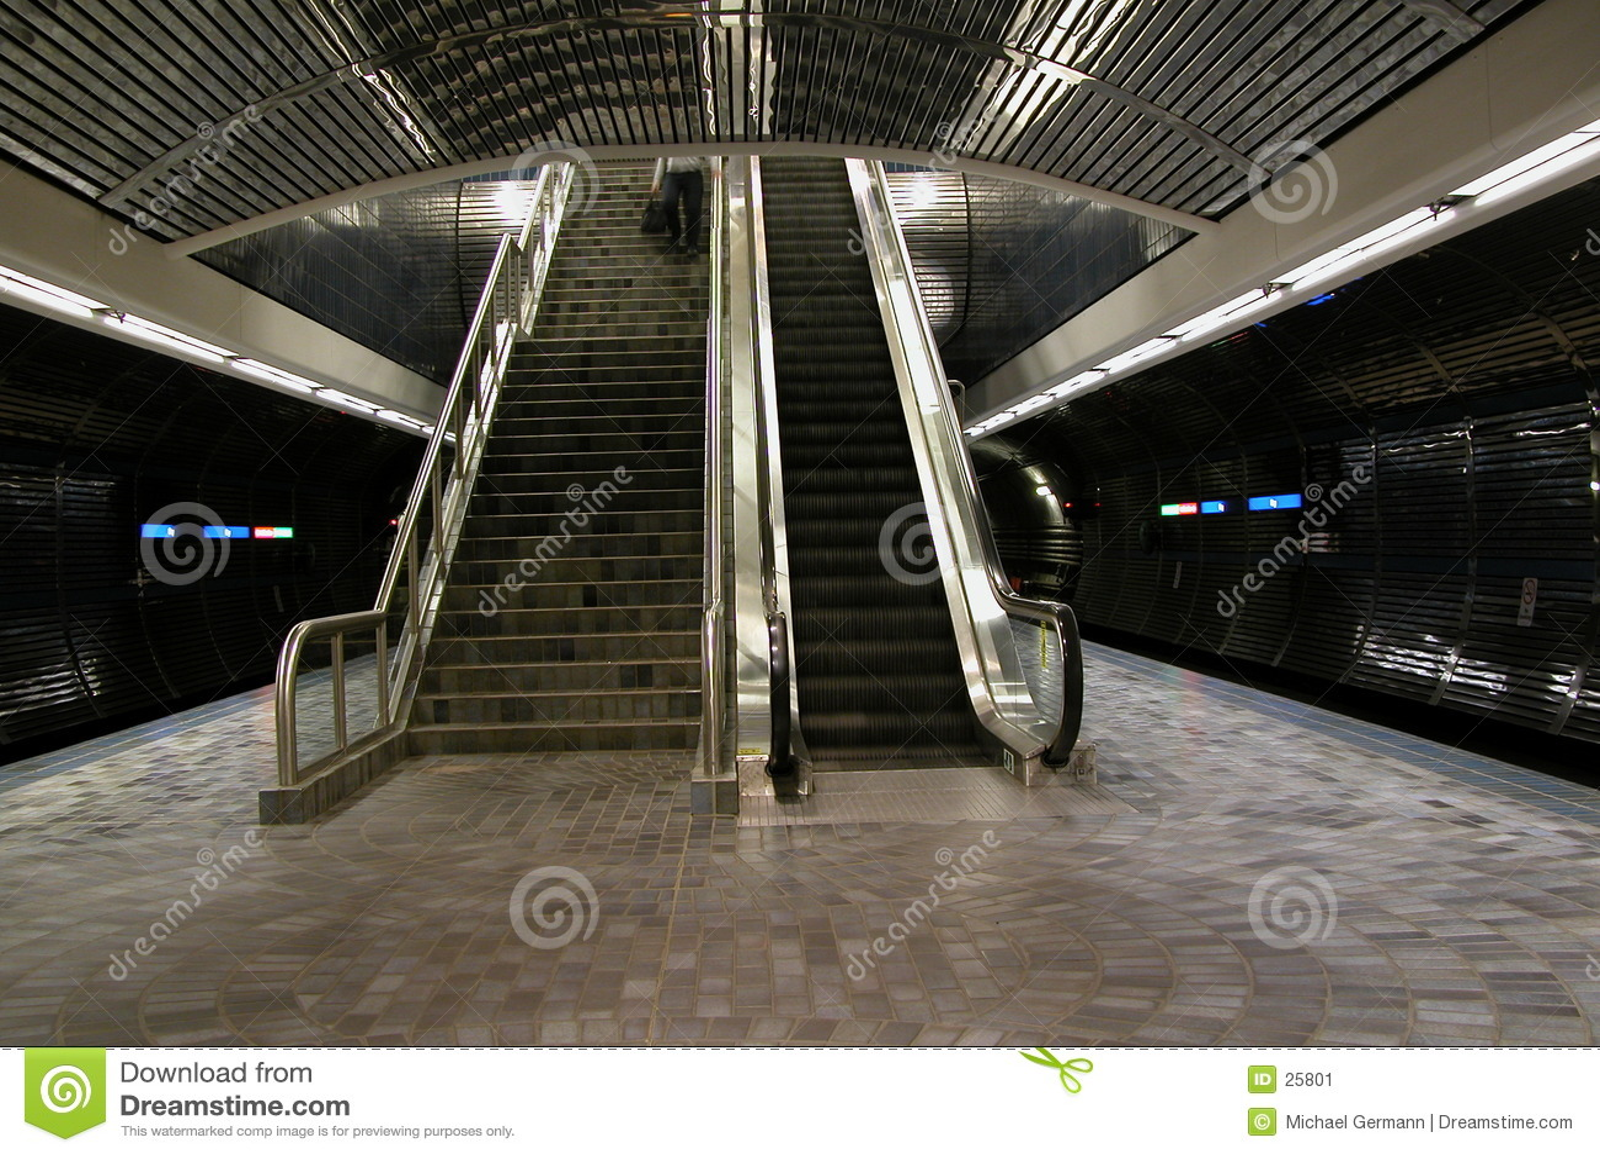 Stairs & Escalator